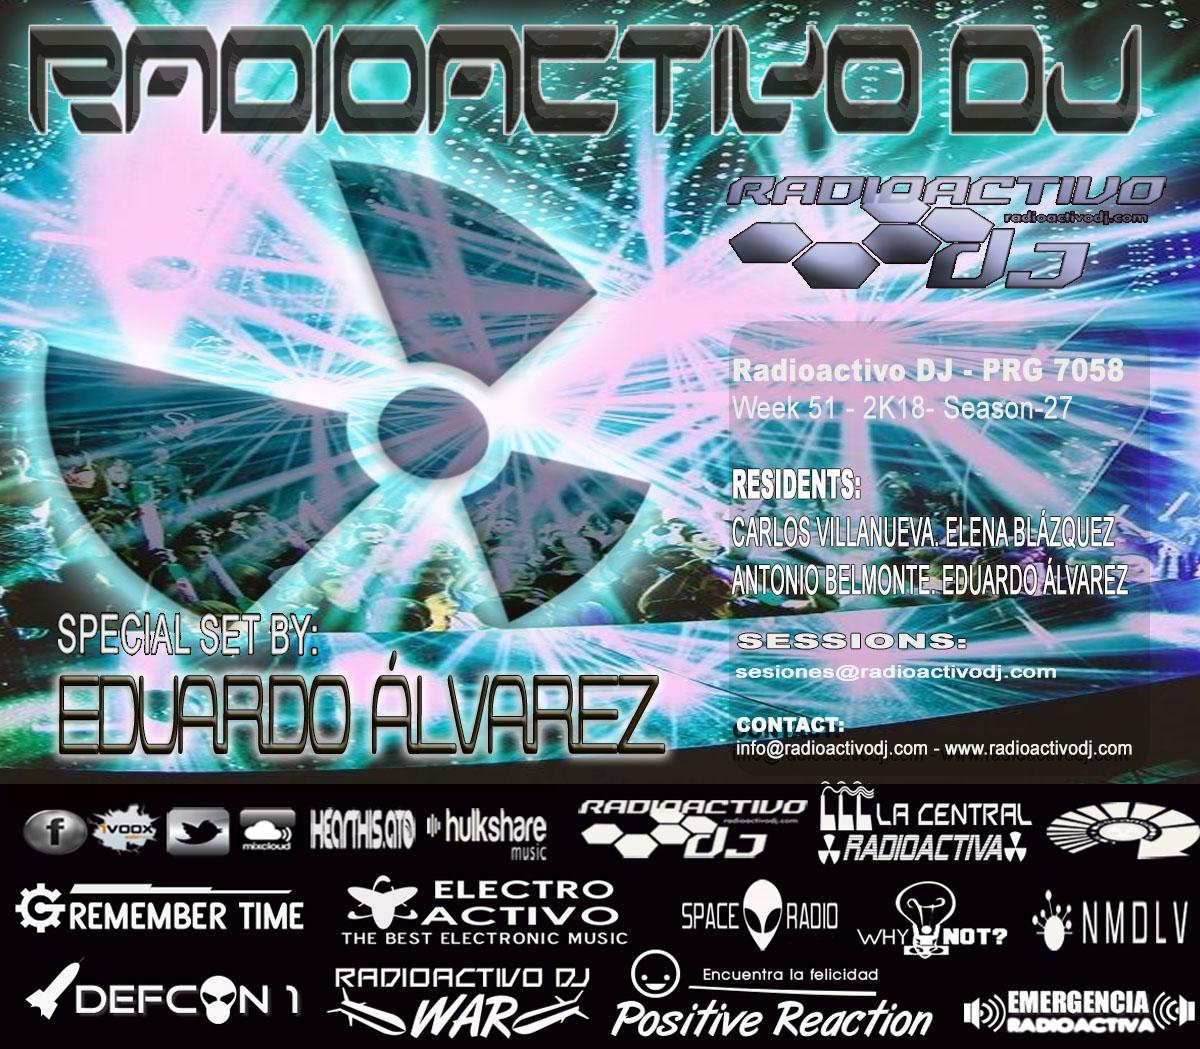 RADIOACTIVO-DJ-51-2018